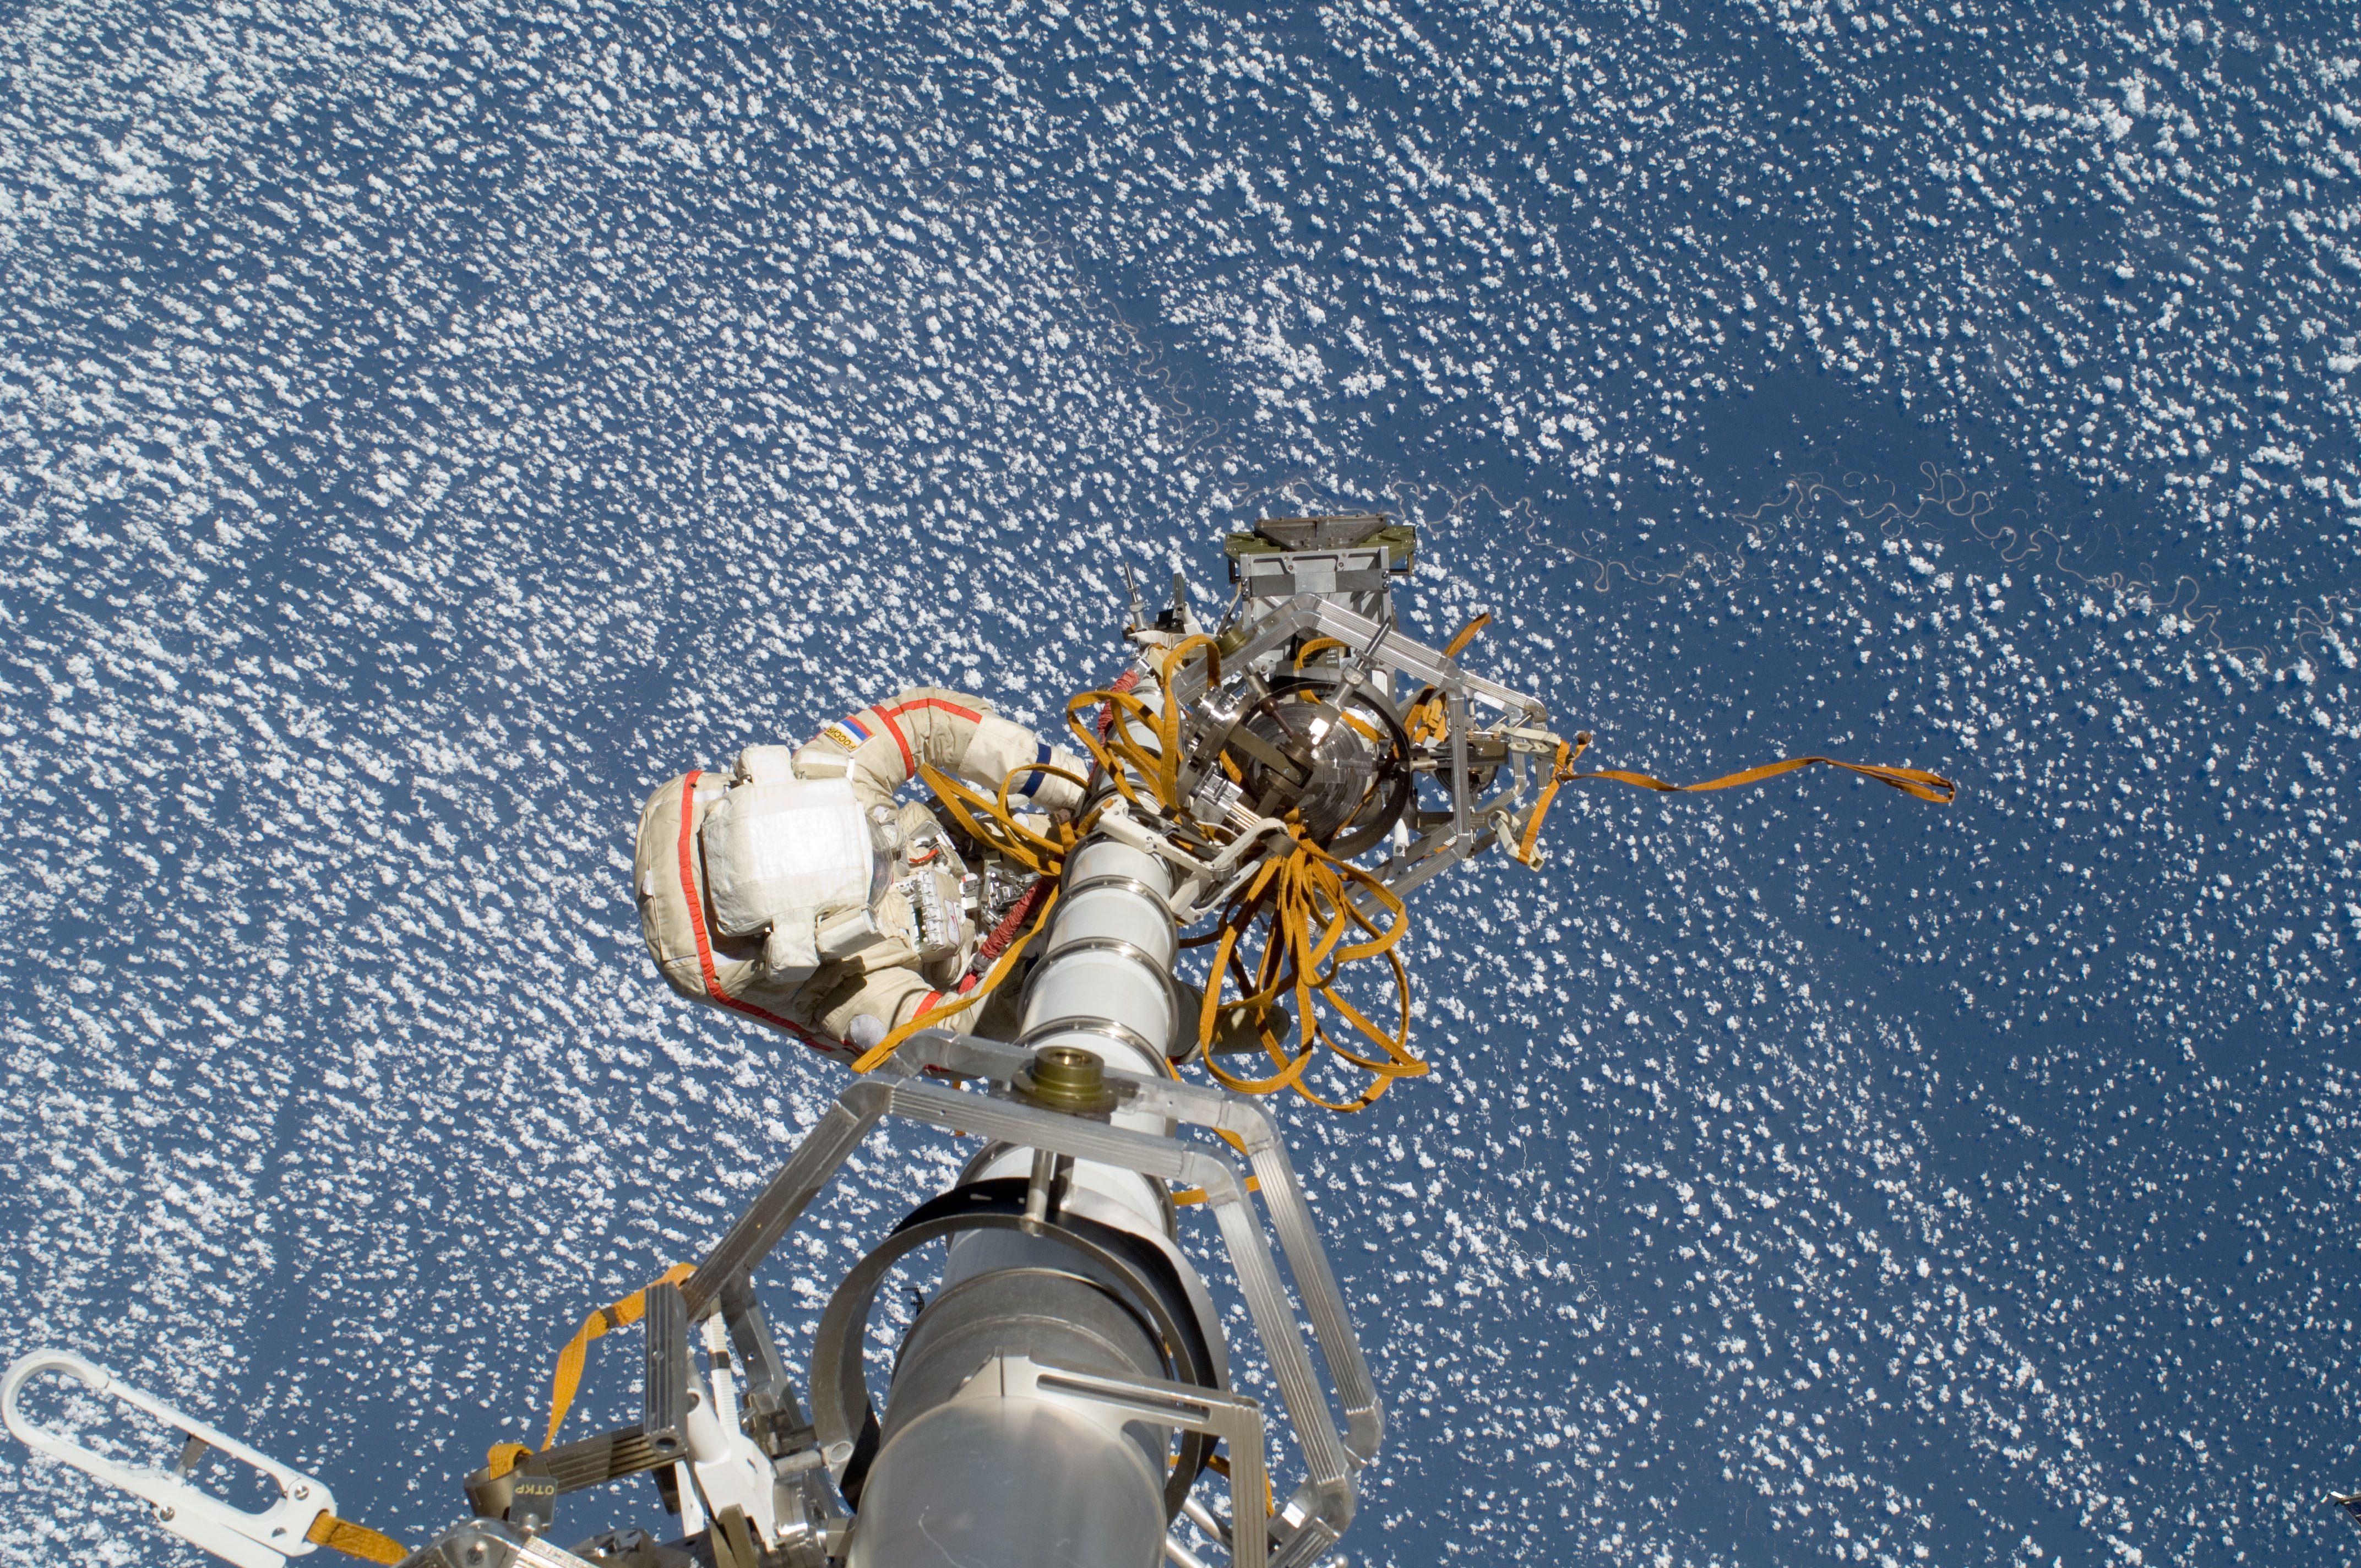 Russian Cosmonaut Preps for Spacewalk